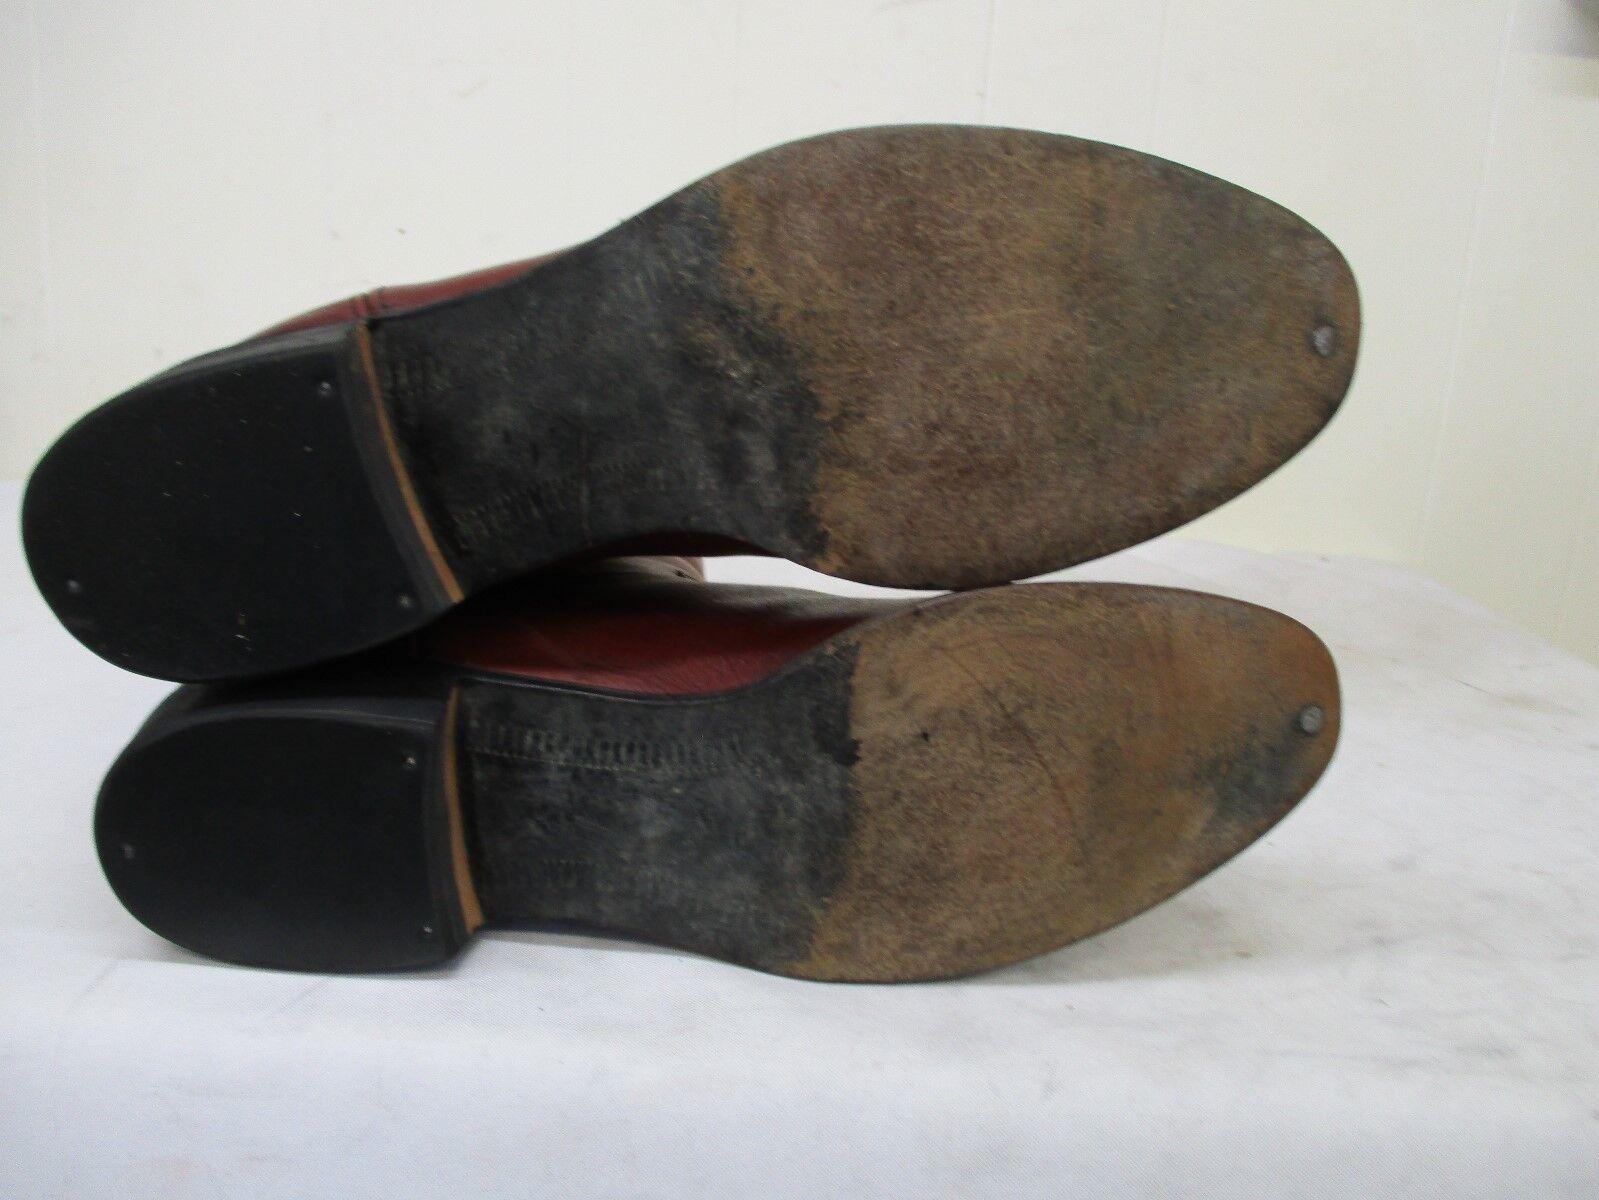 JS Justin London Tan Tan Tan Leather Cowboy Boots Mens Size 9.5 D Style 50005 3a0f59